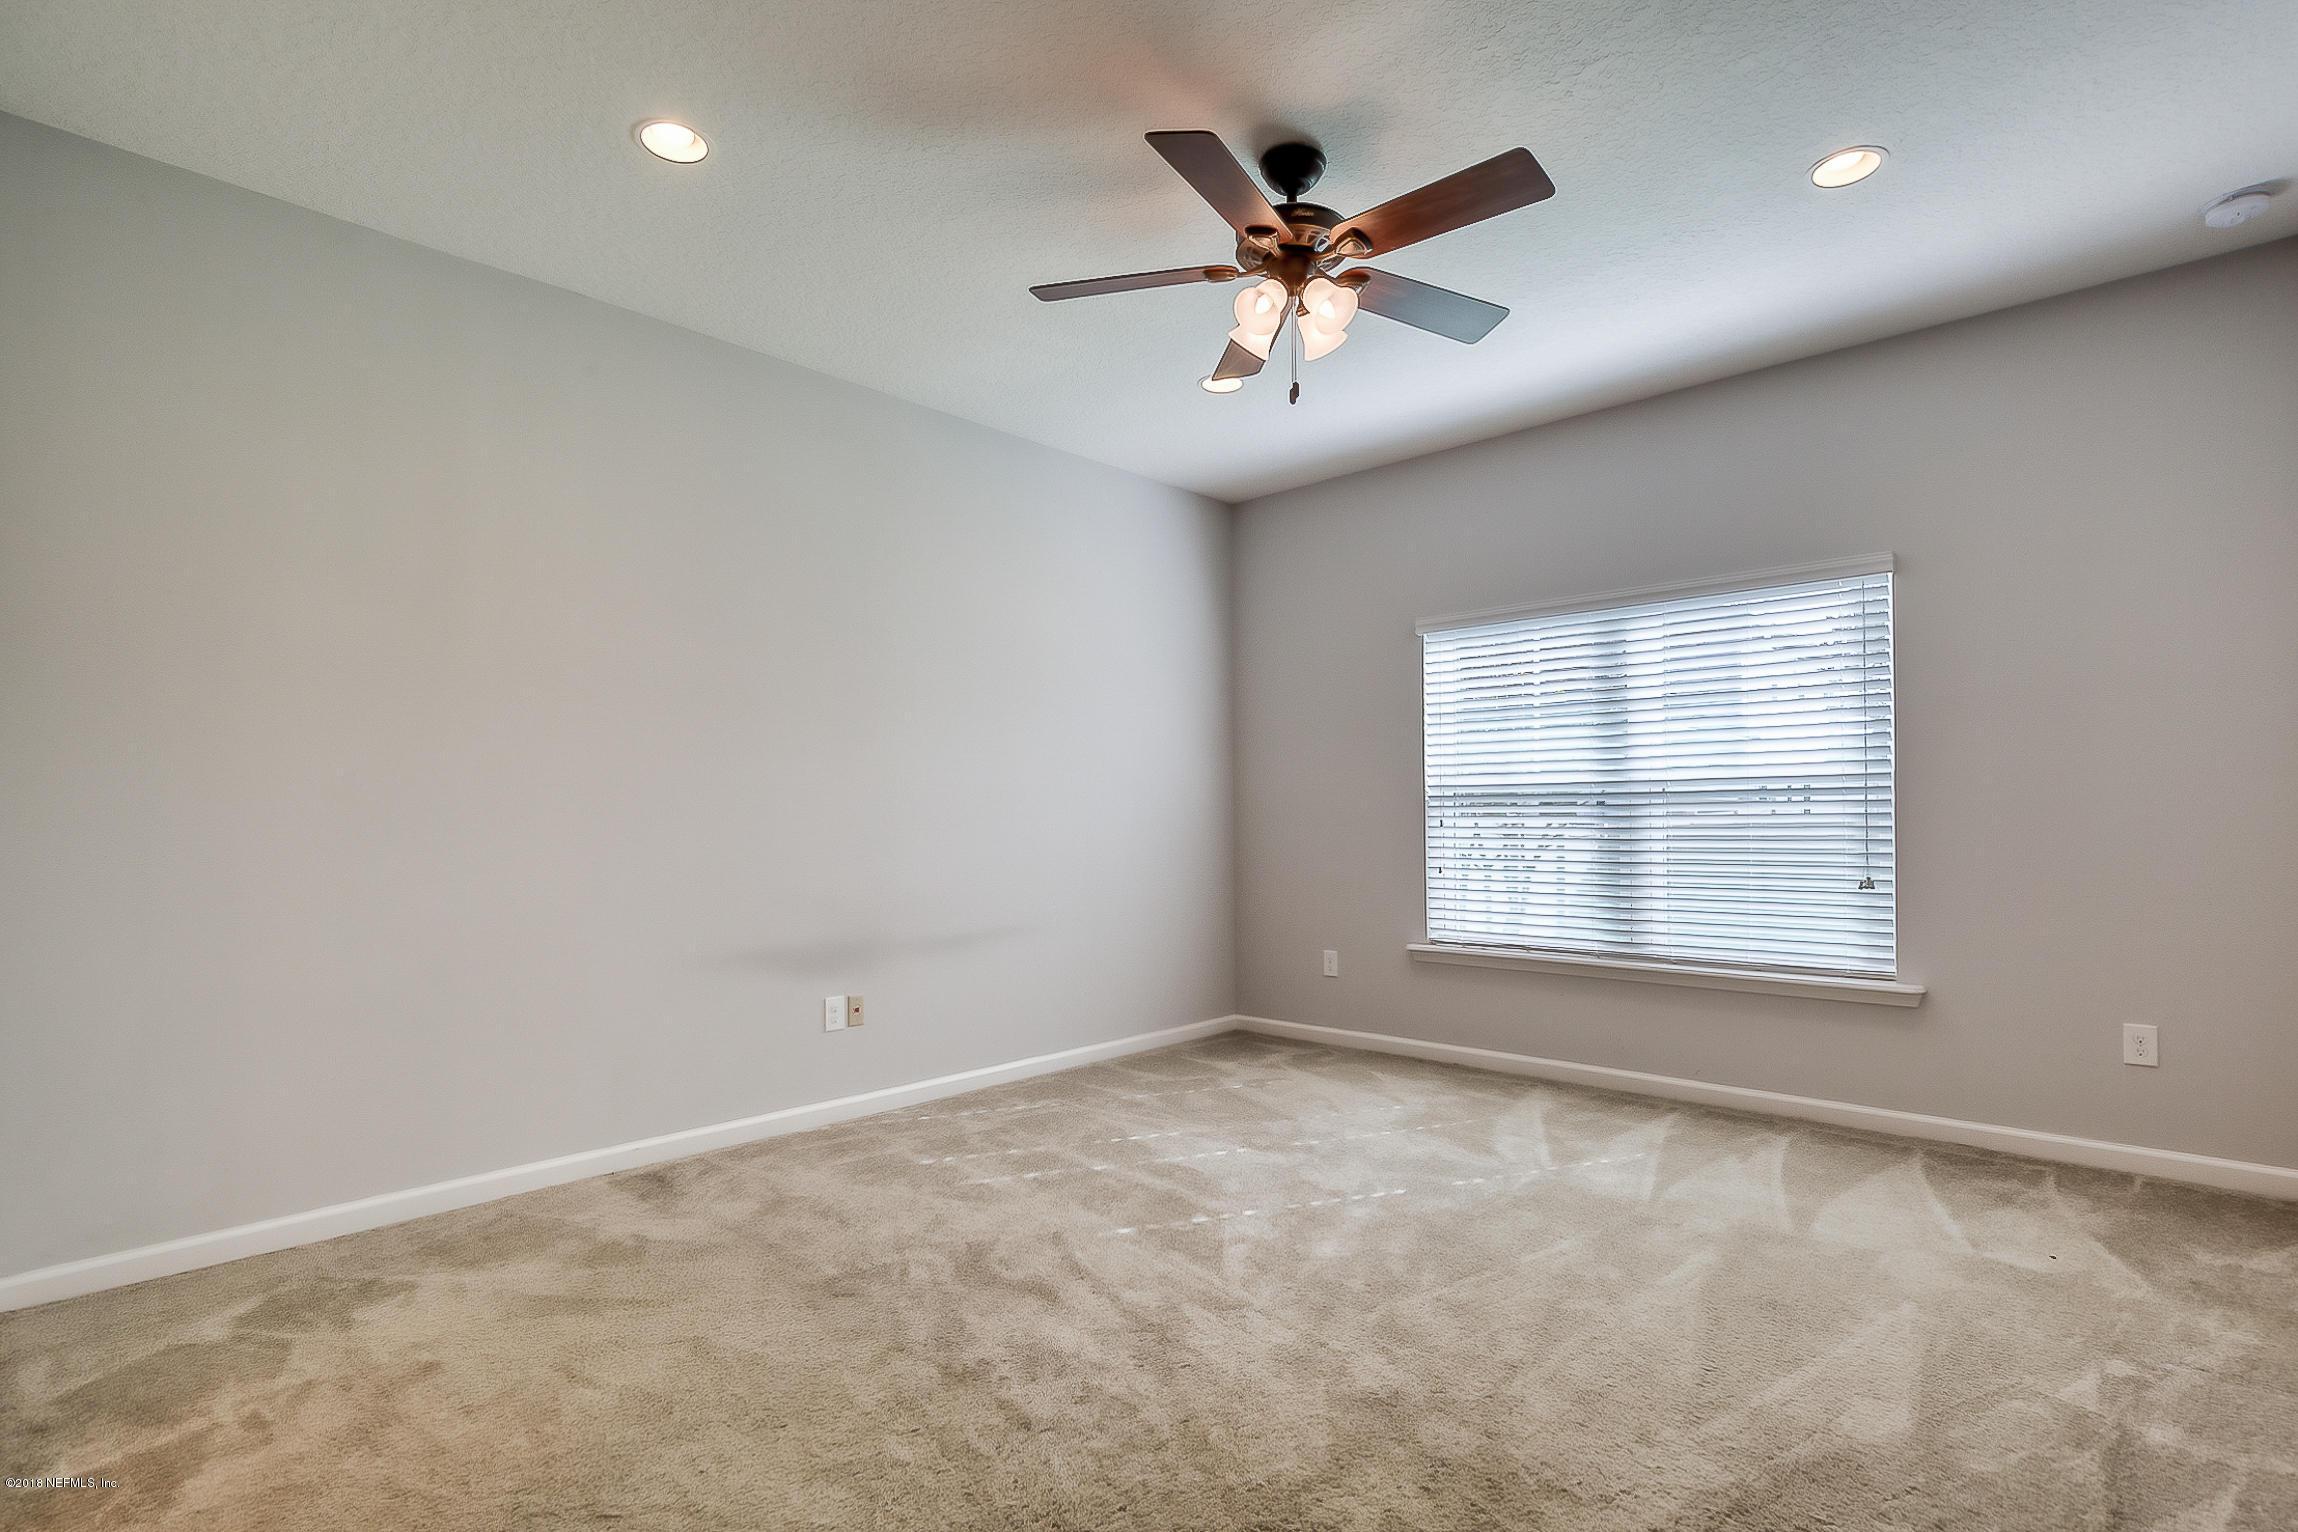 208 QUEENSLAND, JACKSONVILLE, FLORIDA 32081, 3 Bedrooms Bedrooms, ,2 BathroomsBathrooms,Residential - single family,For sale,QUEENSLAND,971243